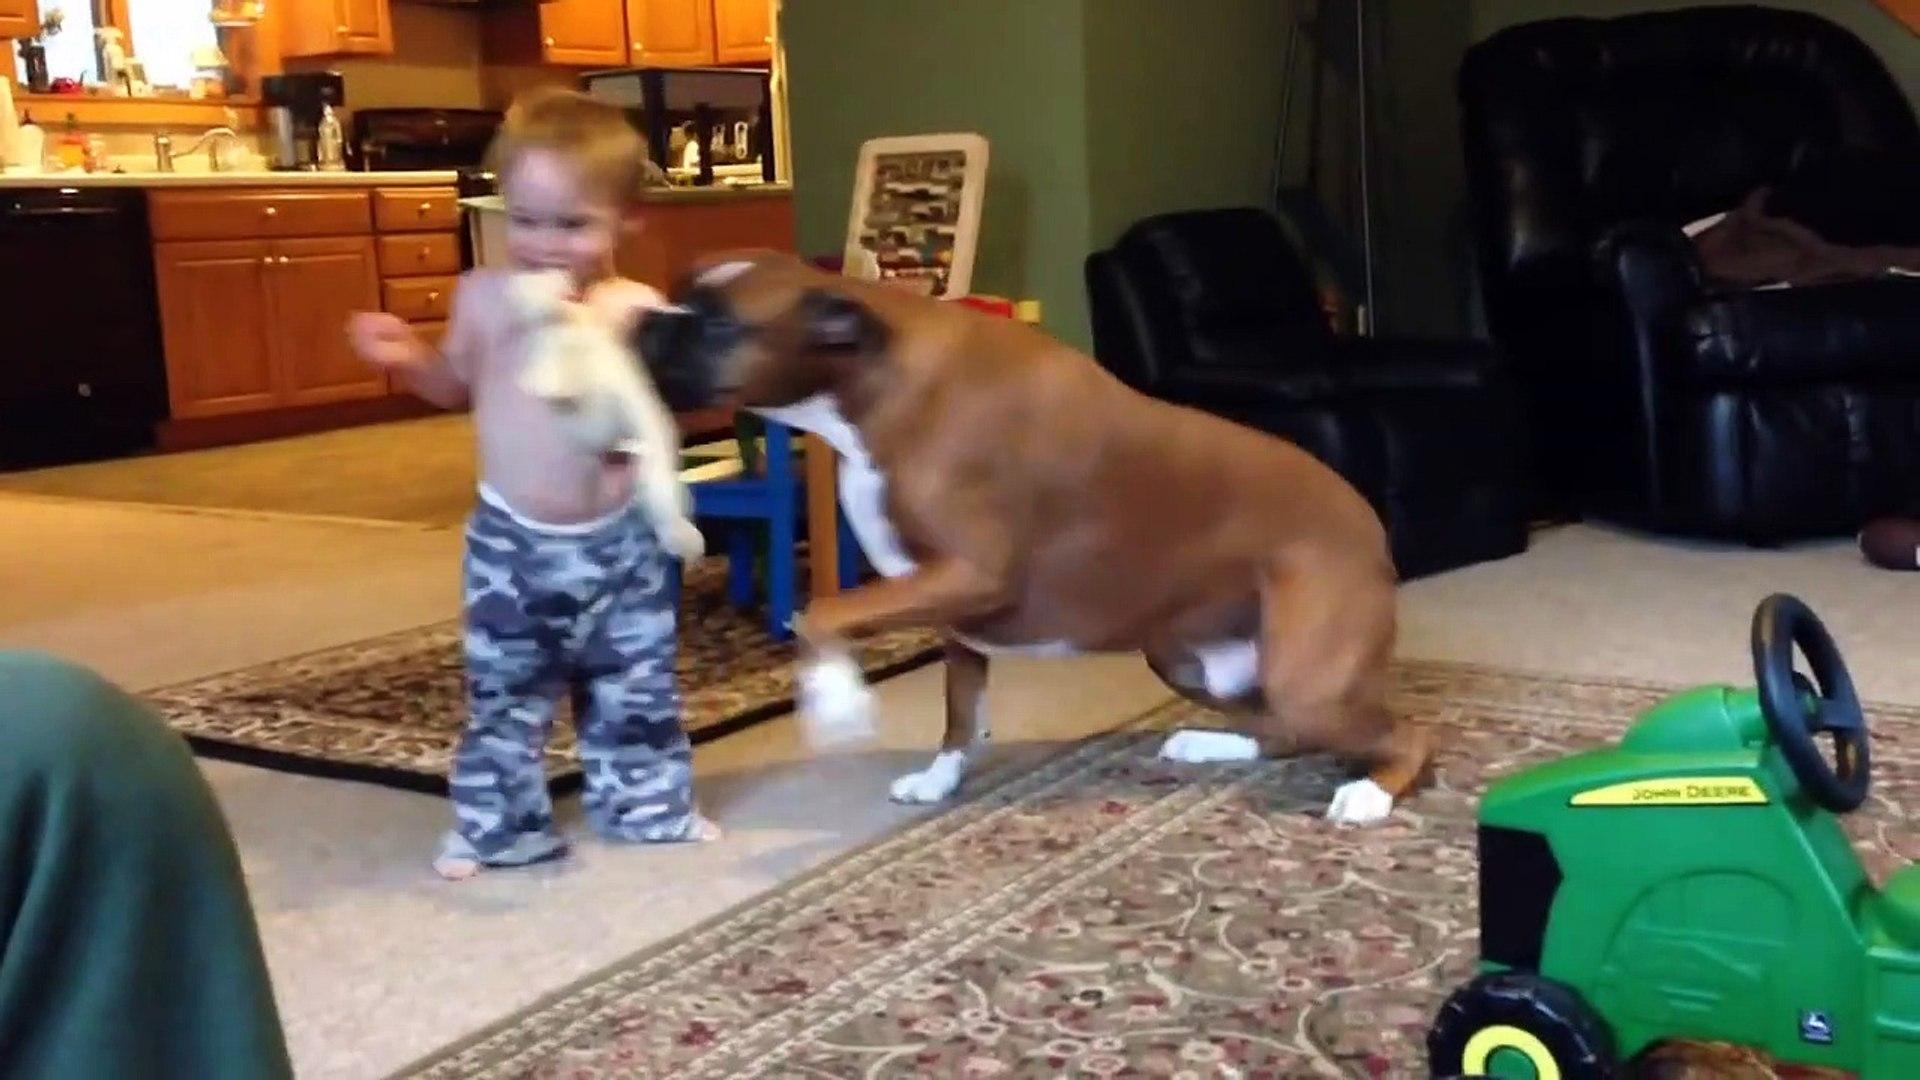 Funniest Cute Kids & Pets Home Video Bloopers Ca sdfb sf